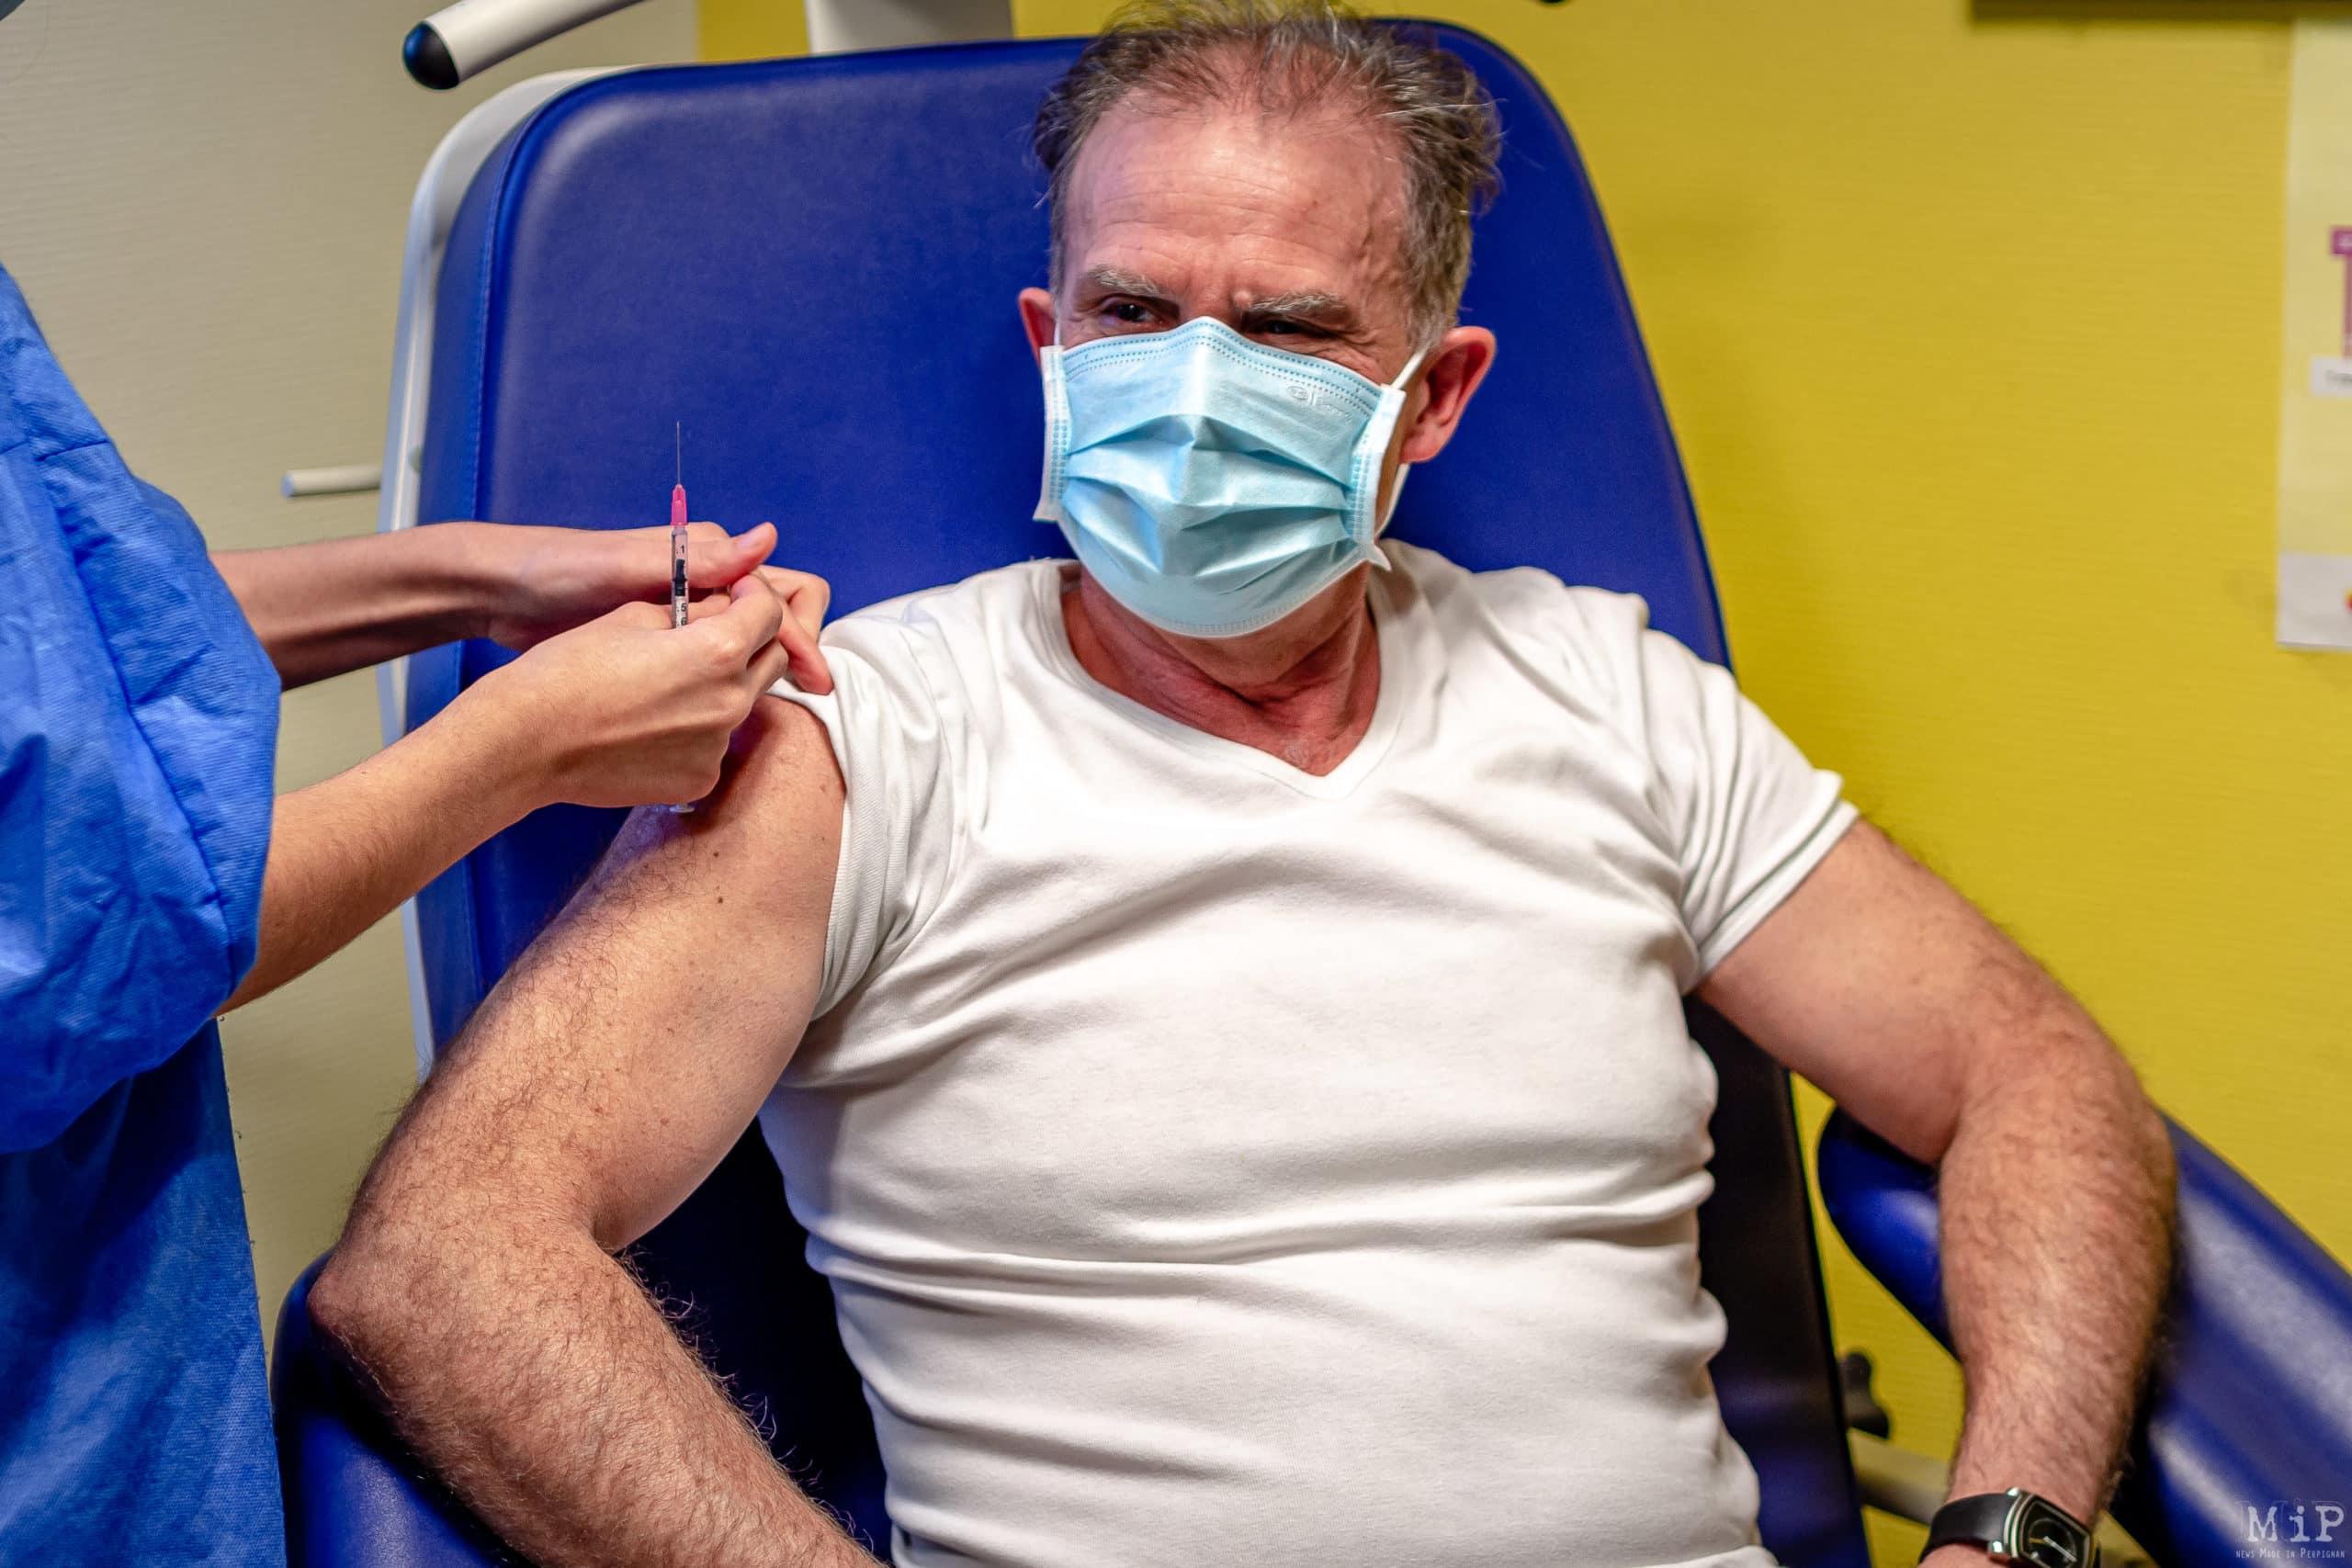 04/01/2021, Perpignan, France, Vaccination Covid-19 centre © Arnaud Le Vu / MiP